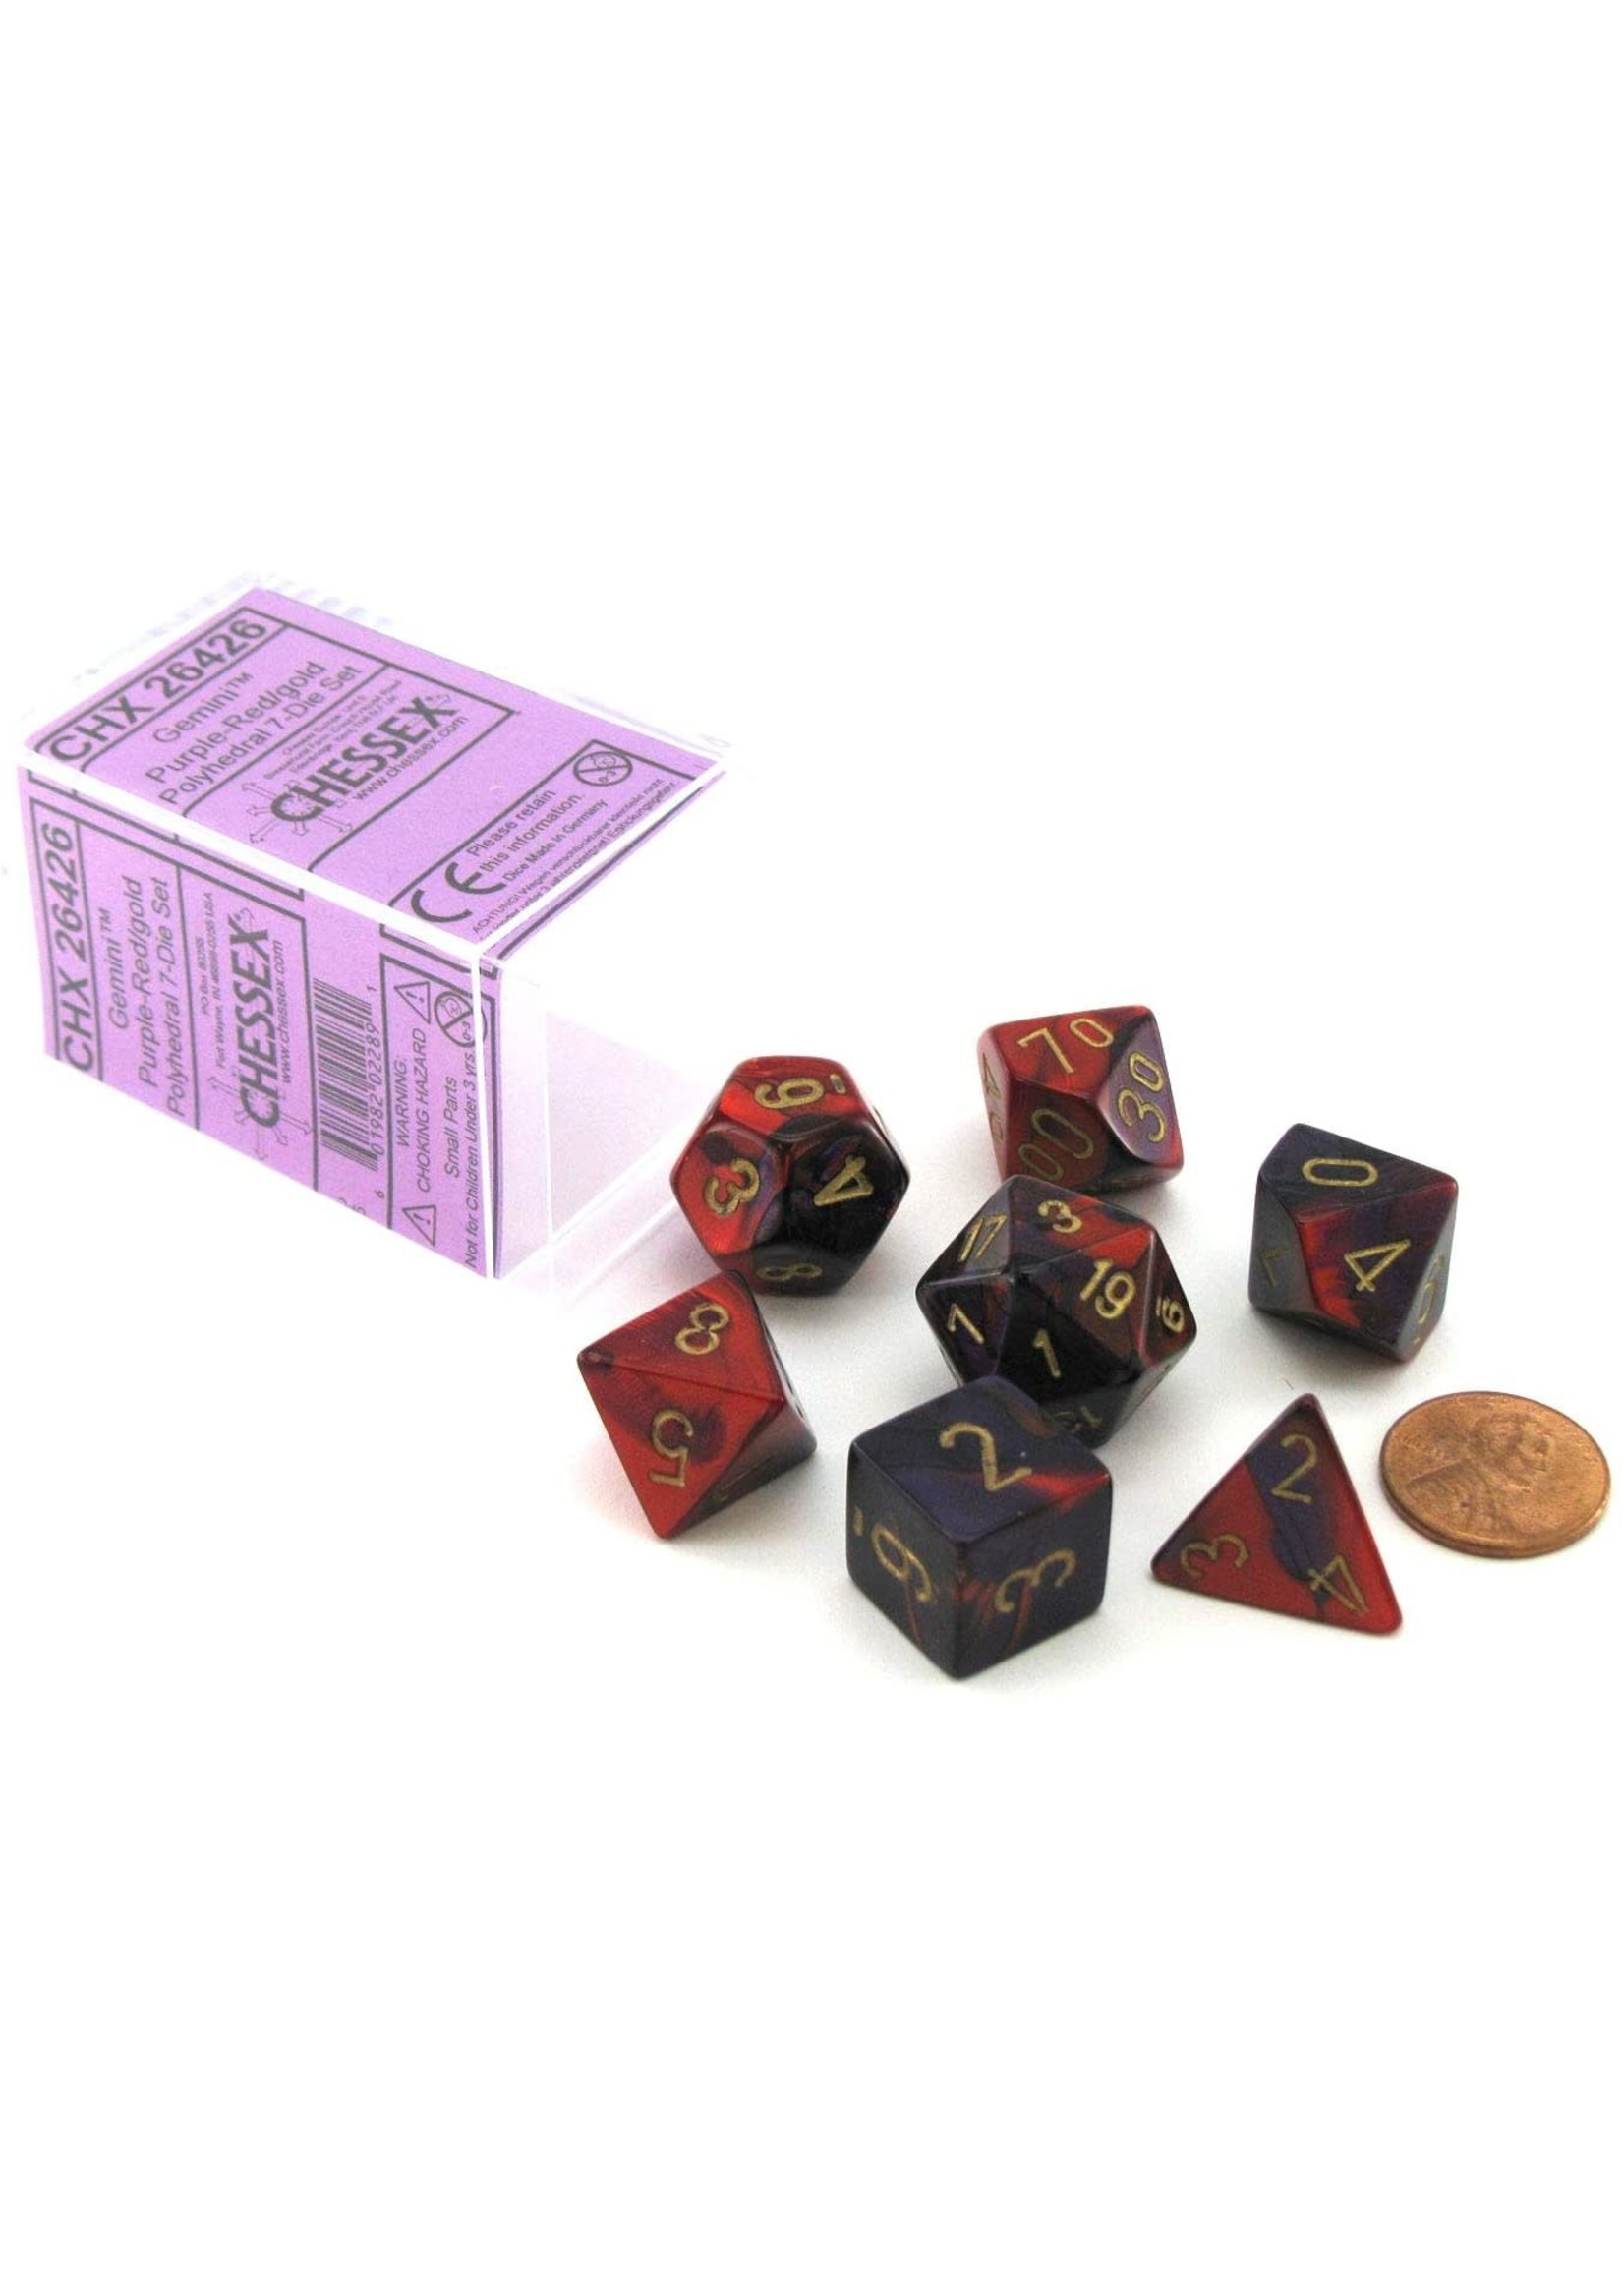 Chessex Gemini Poly 7 set: Purple & Red w/ Gold